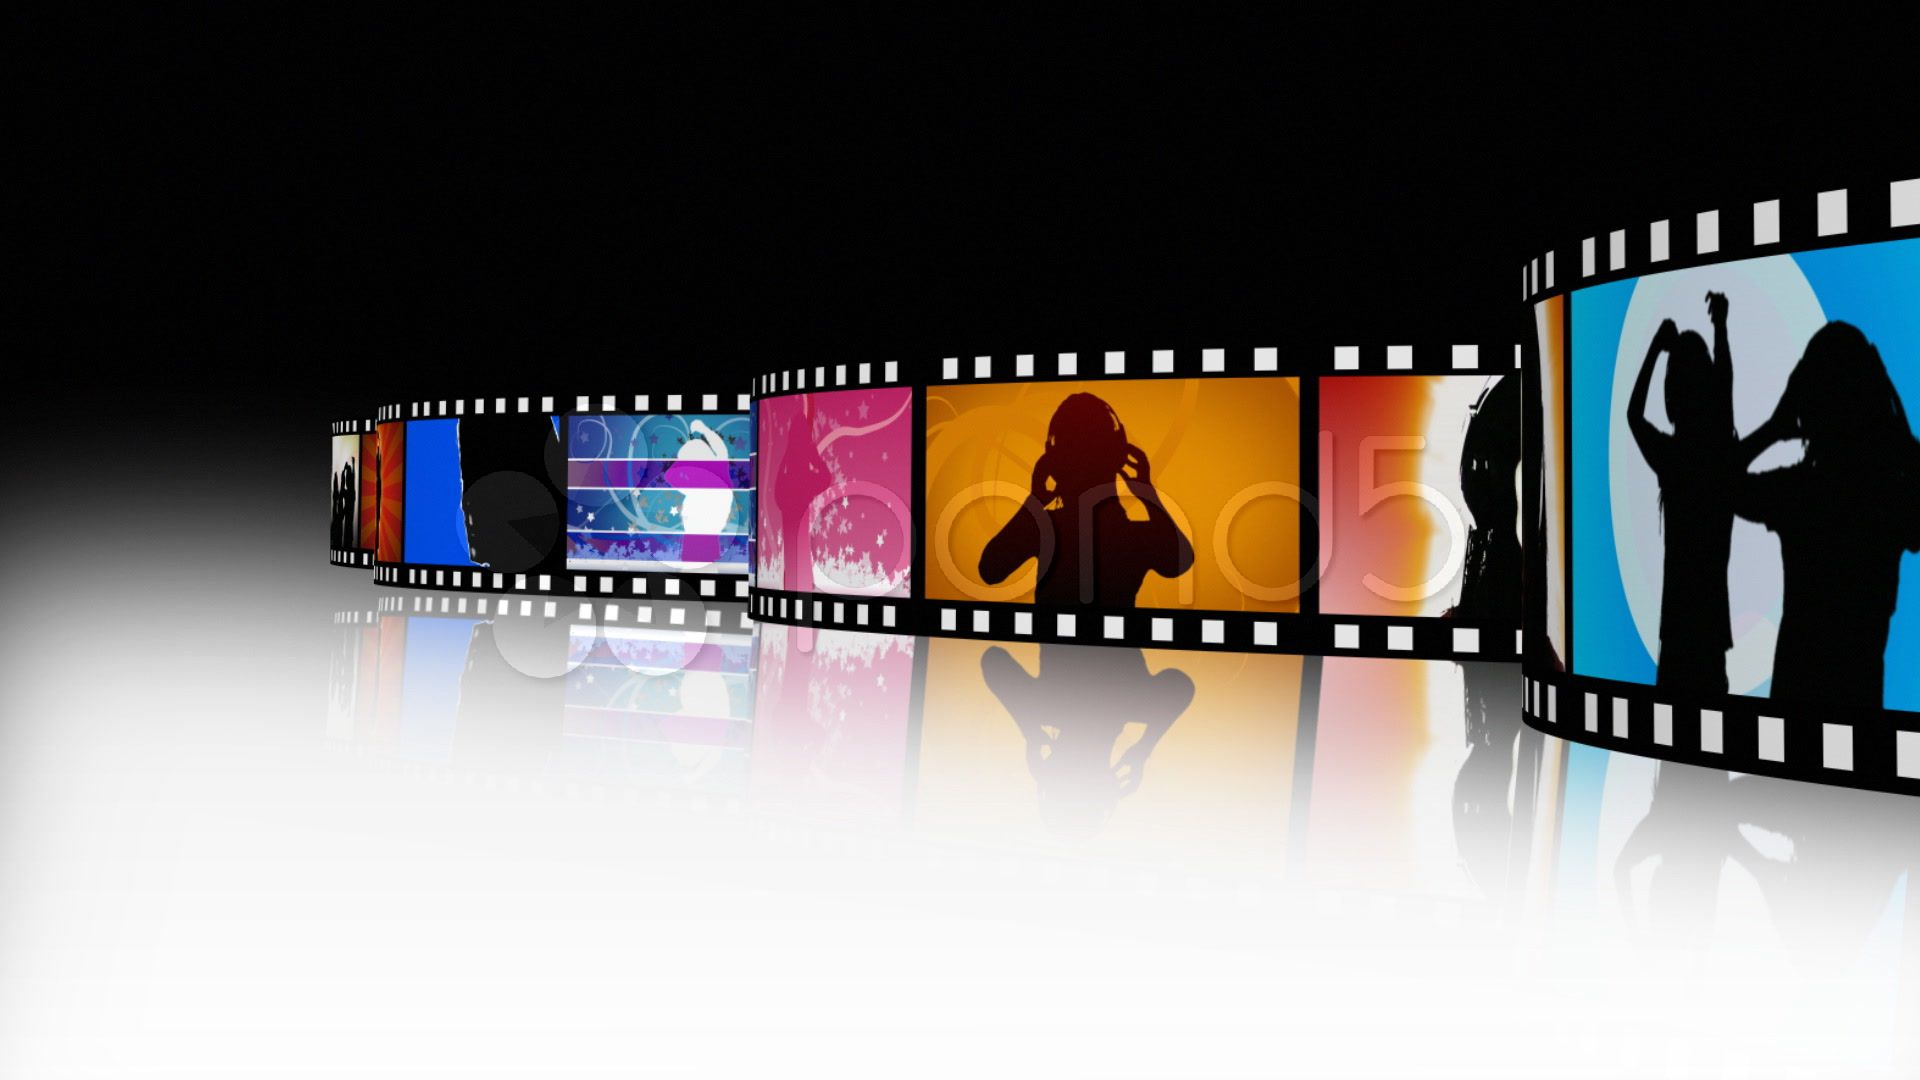 Film strip animation Motion Background VideoBlocks